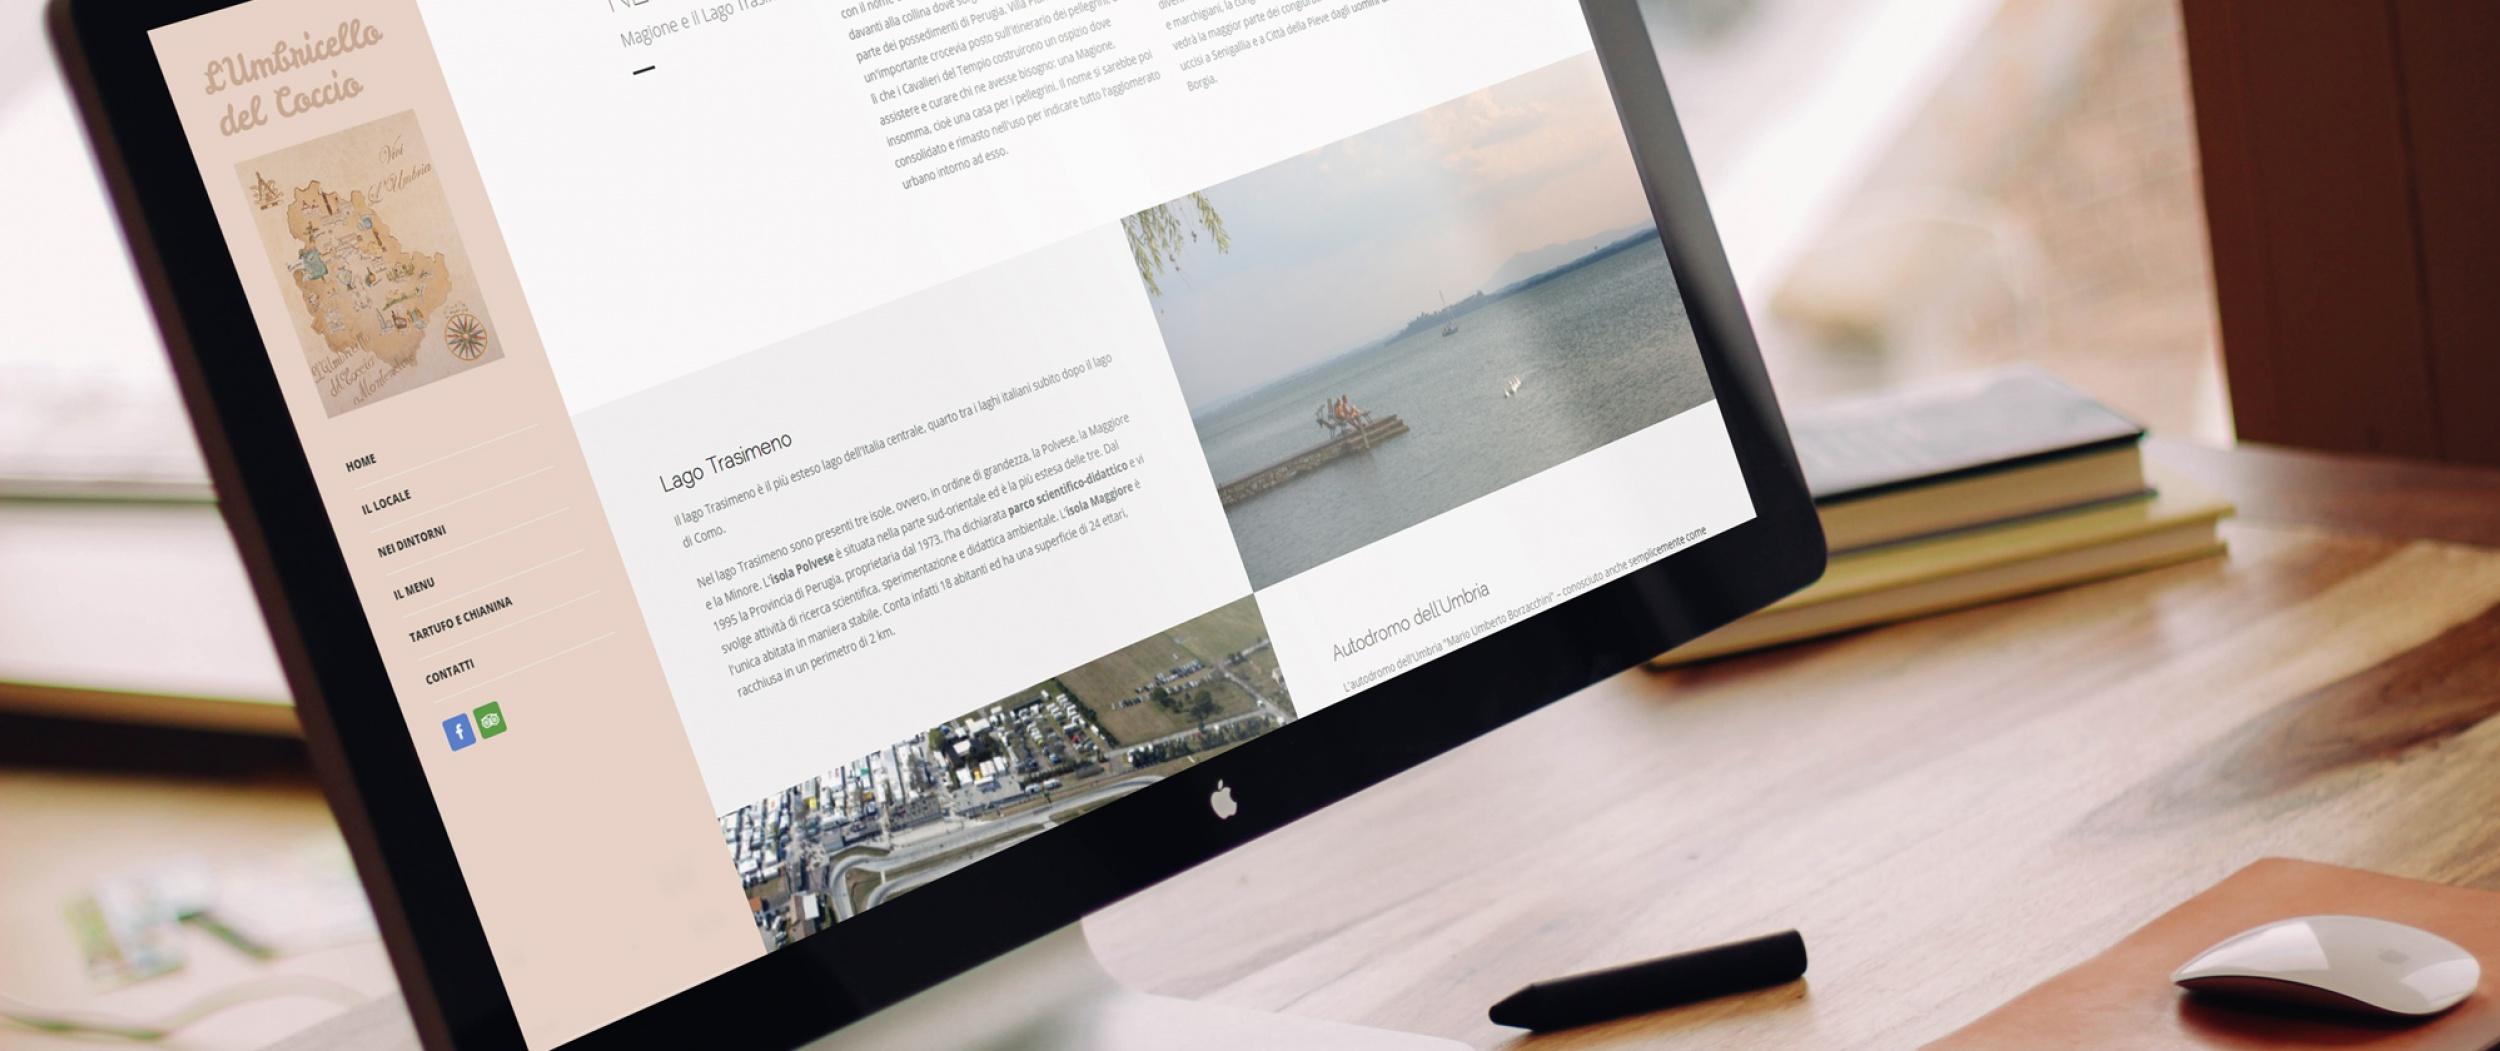 Siti web per ristoranti | Sesinet Perugia